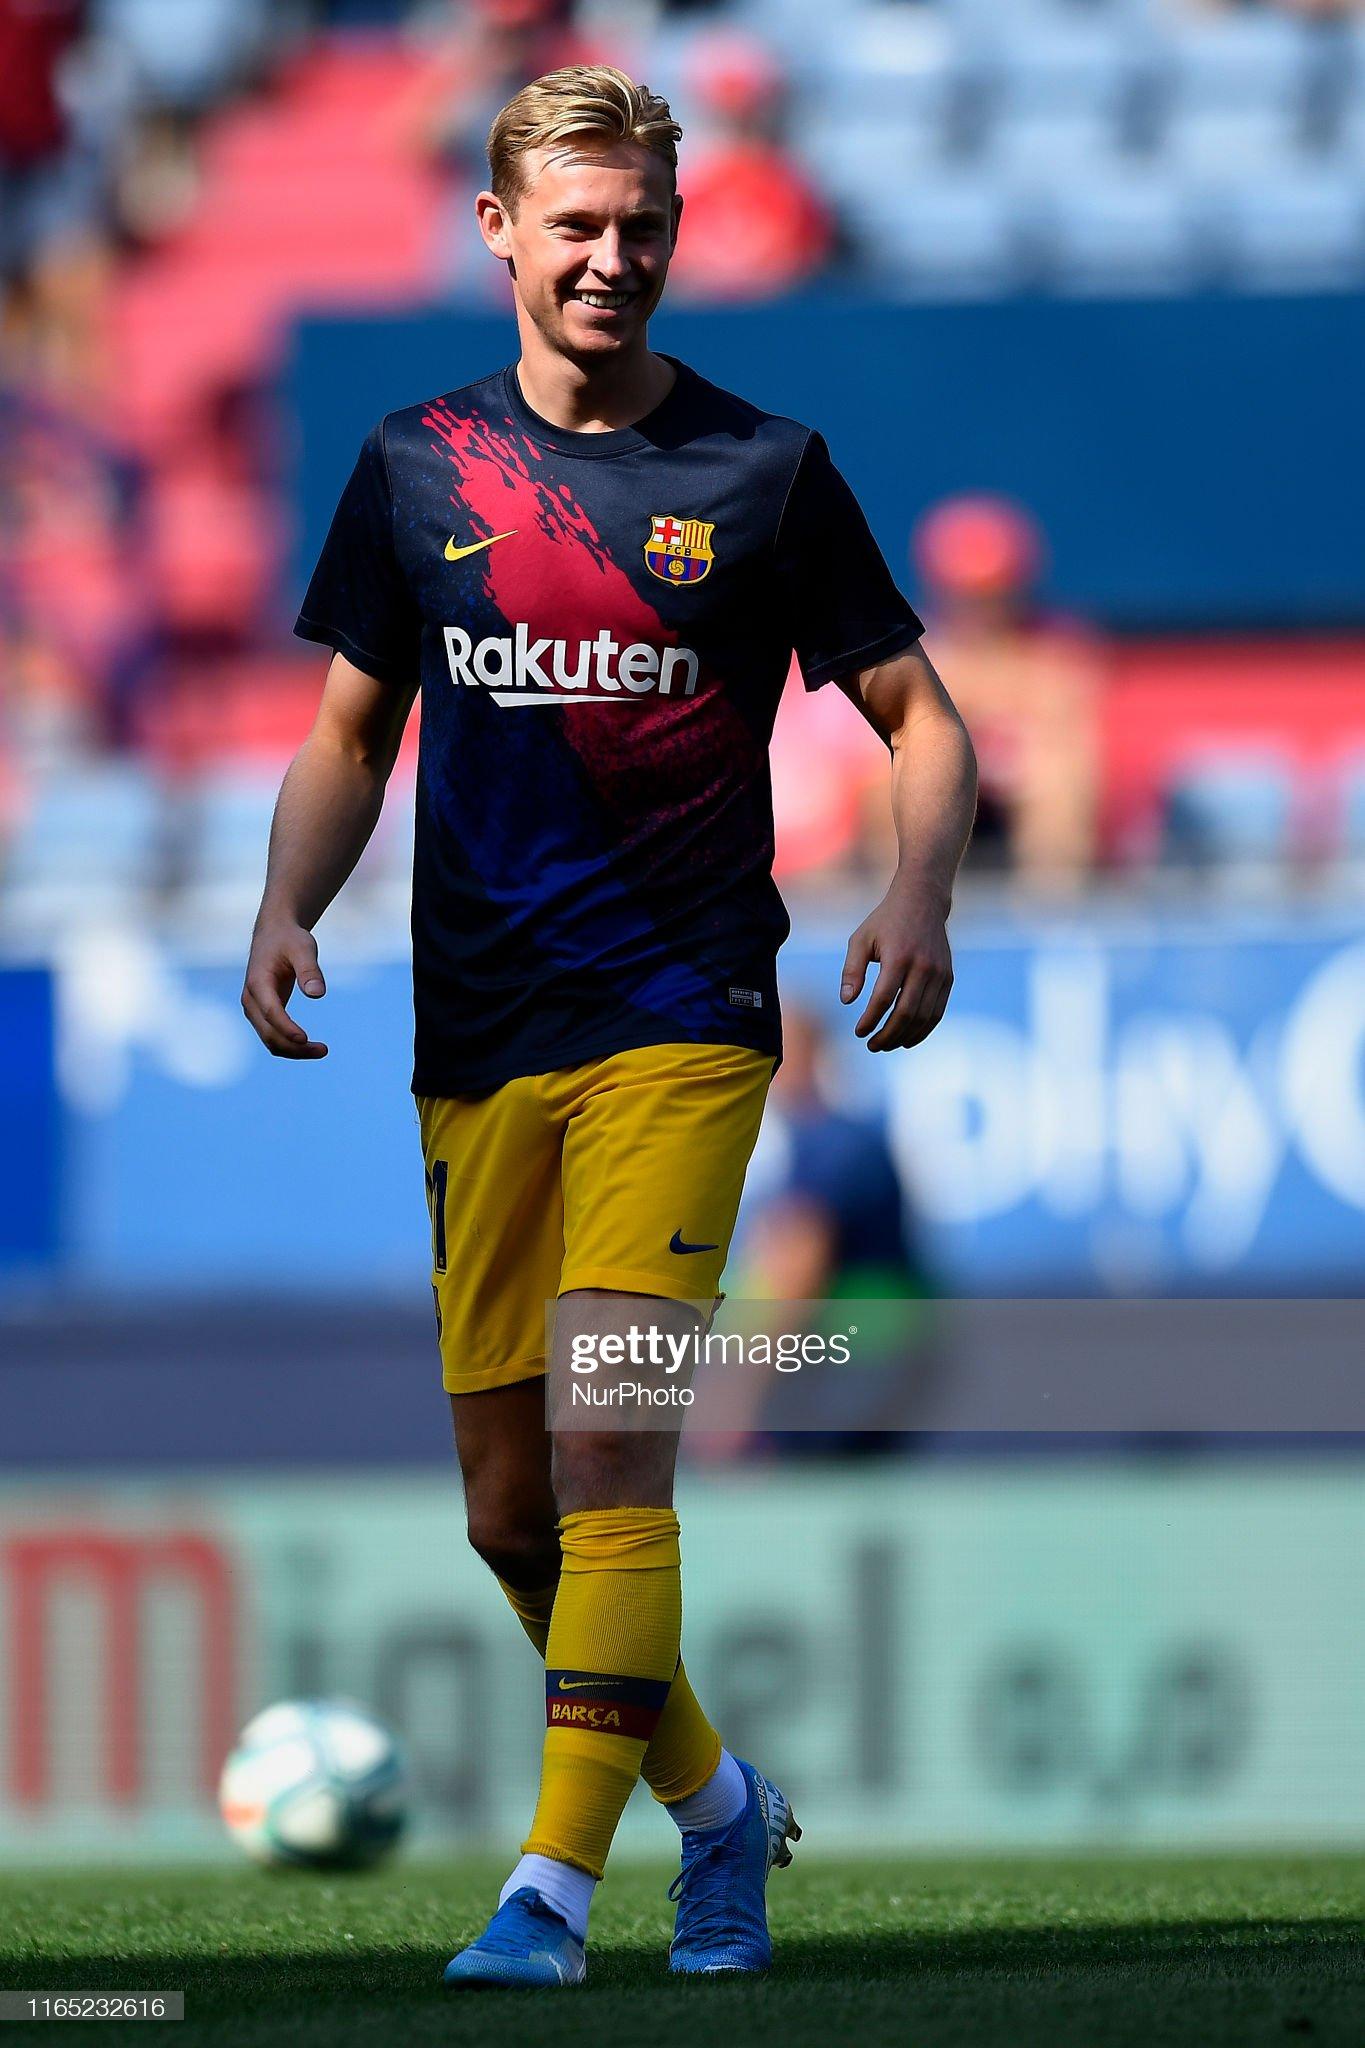 صور مباراة : أوساسونا - برشلونة 2-2 ( 31-08-2019 )  Frenkie-de-jong-of-barcelona-during-the-warmup-before-the-liga-match-picture-id1165232616?s=2048x2048